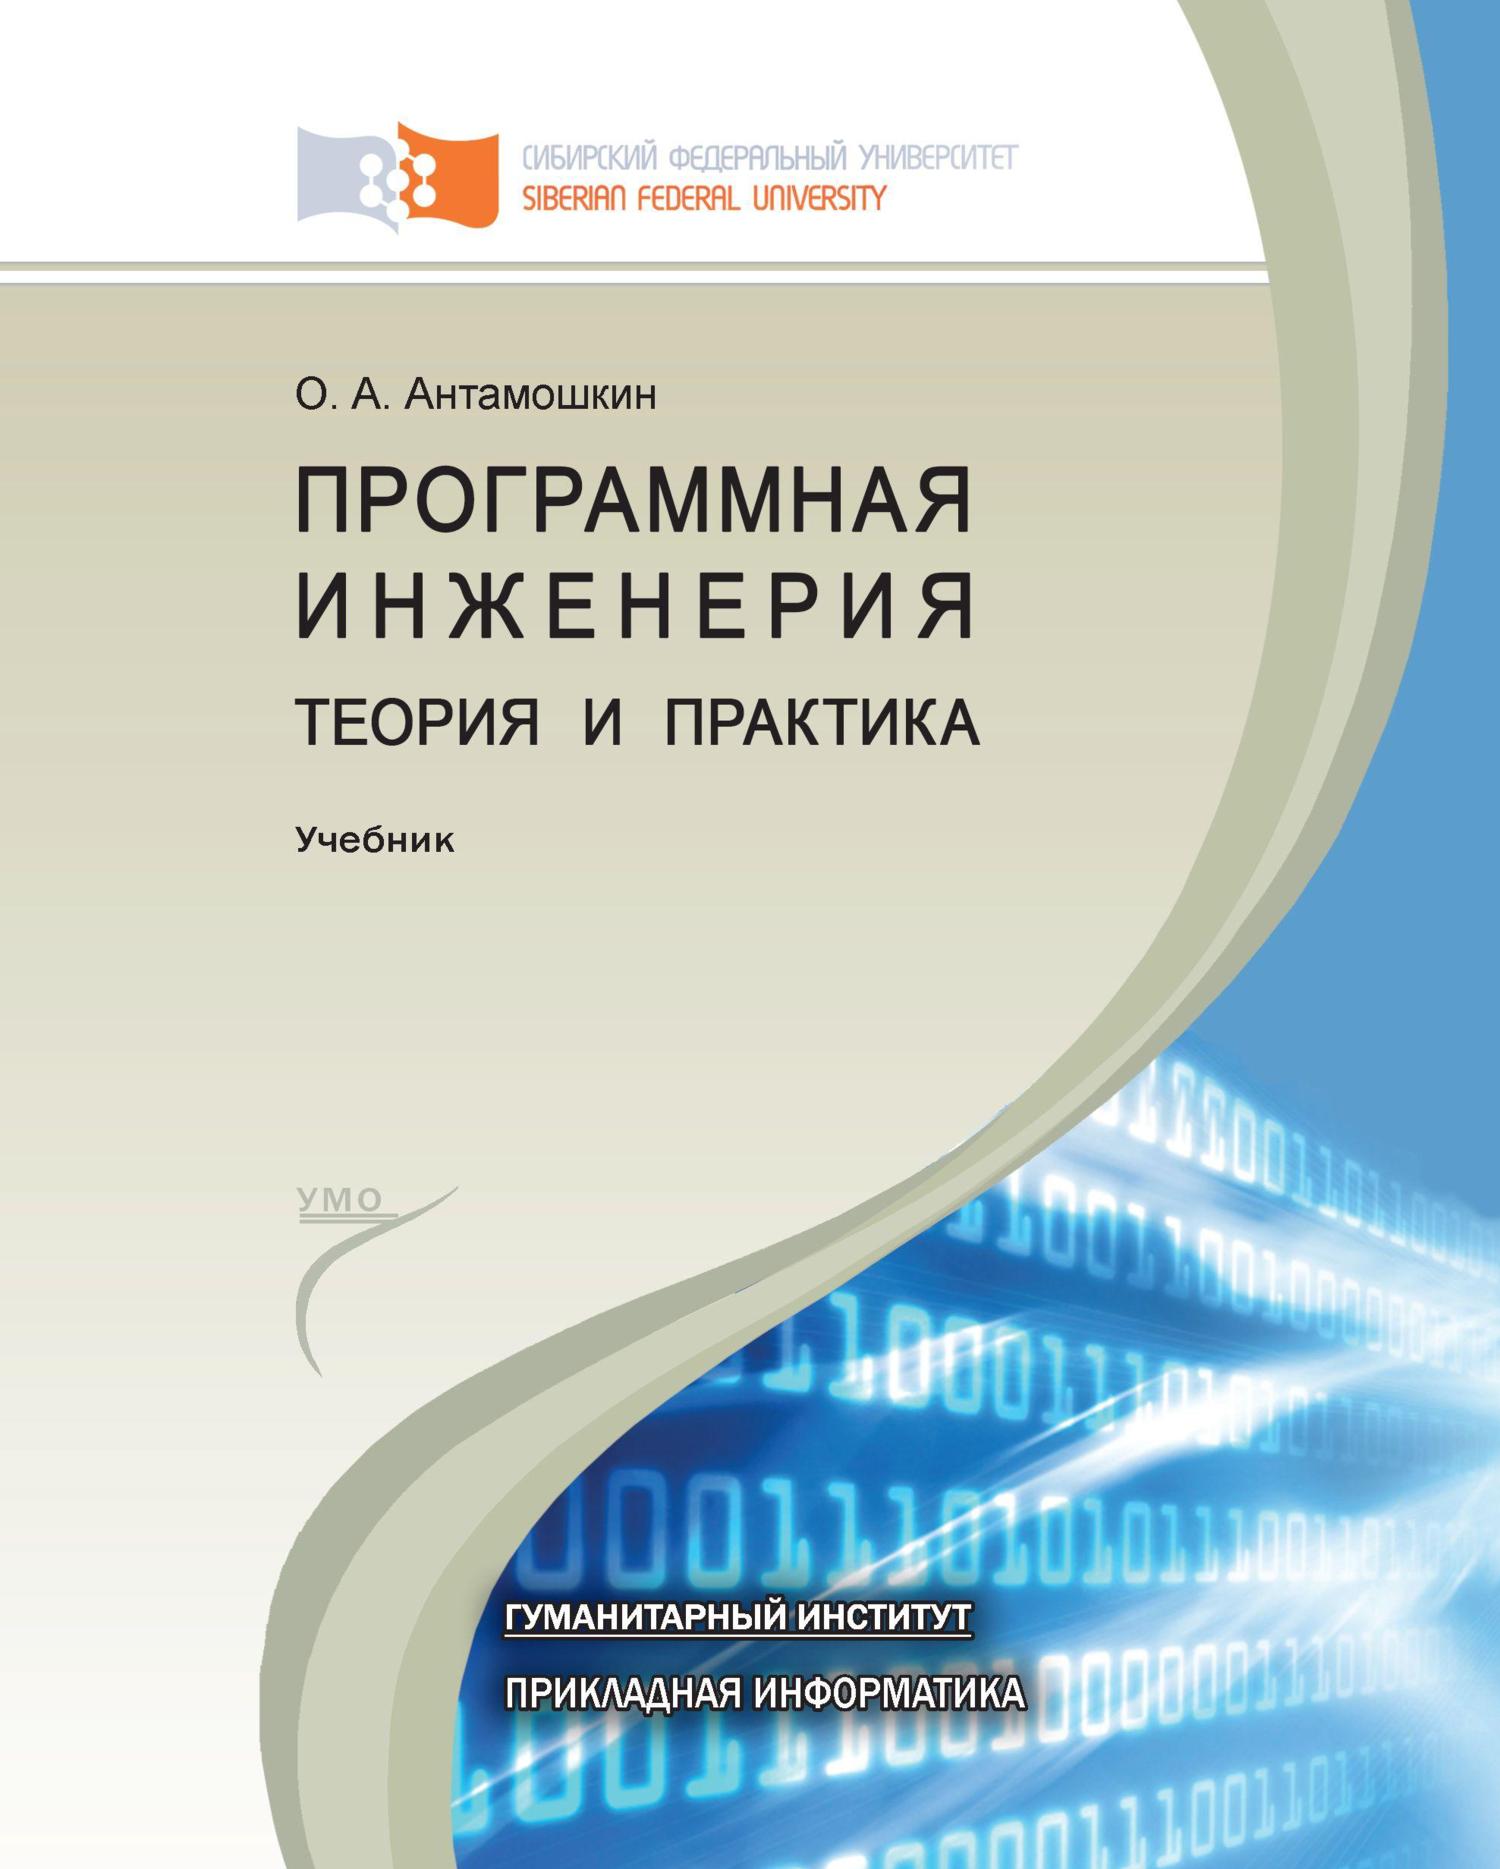 Олеслав Антамошкин - Программная инженерия. Теория и практика